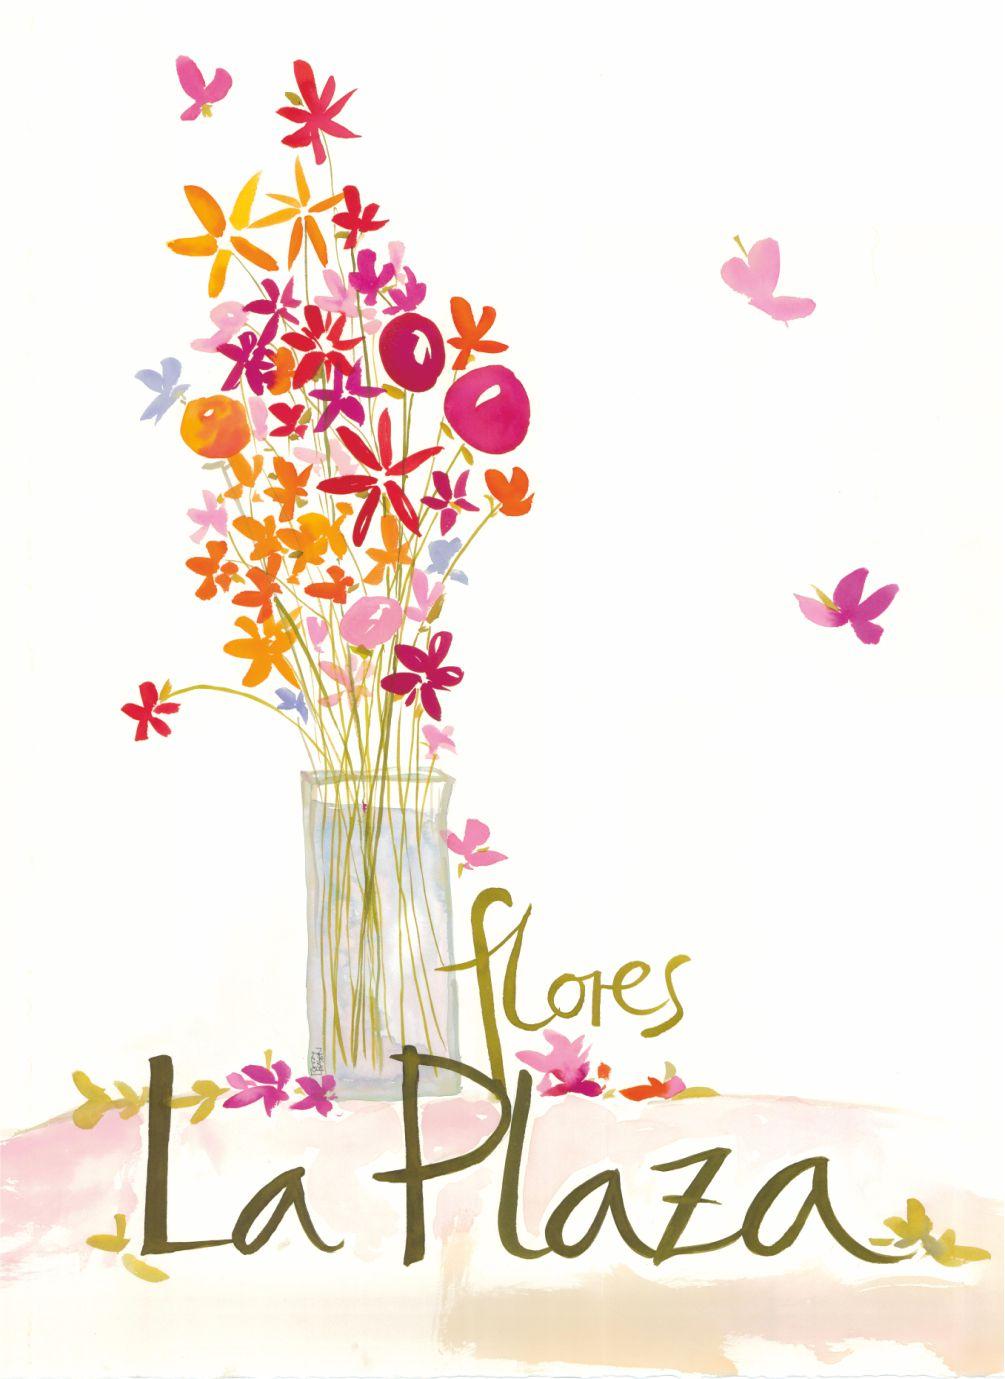 Flores La Plaza, Cangas del Narcea, Asturias